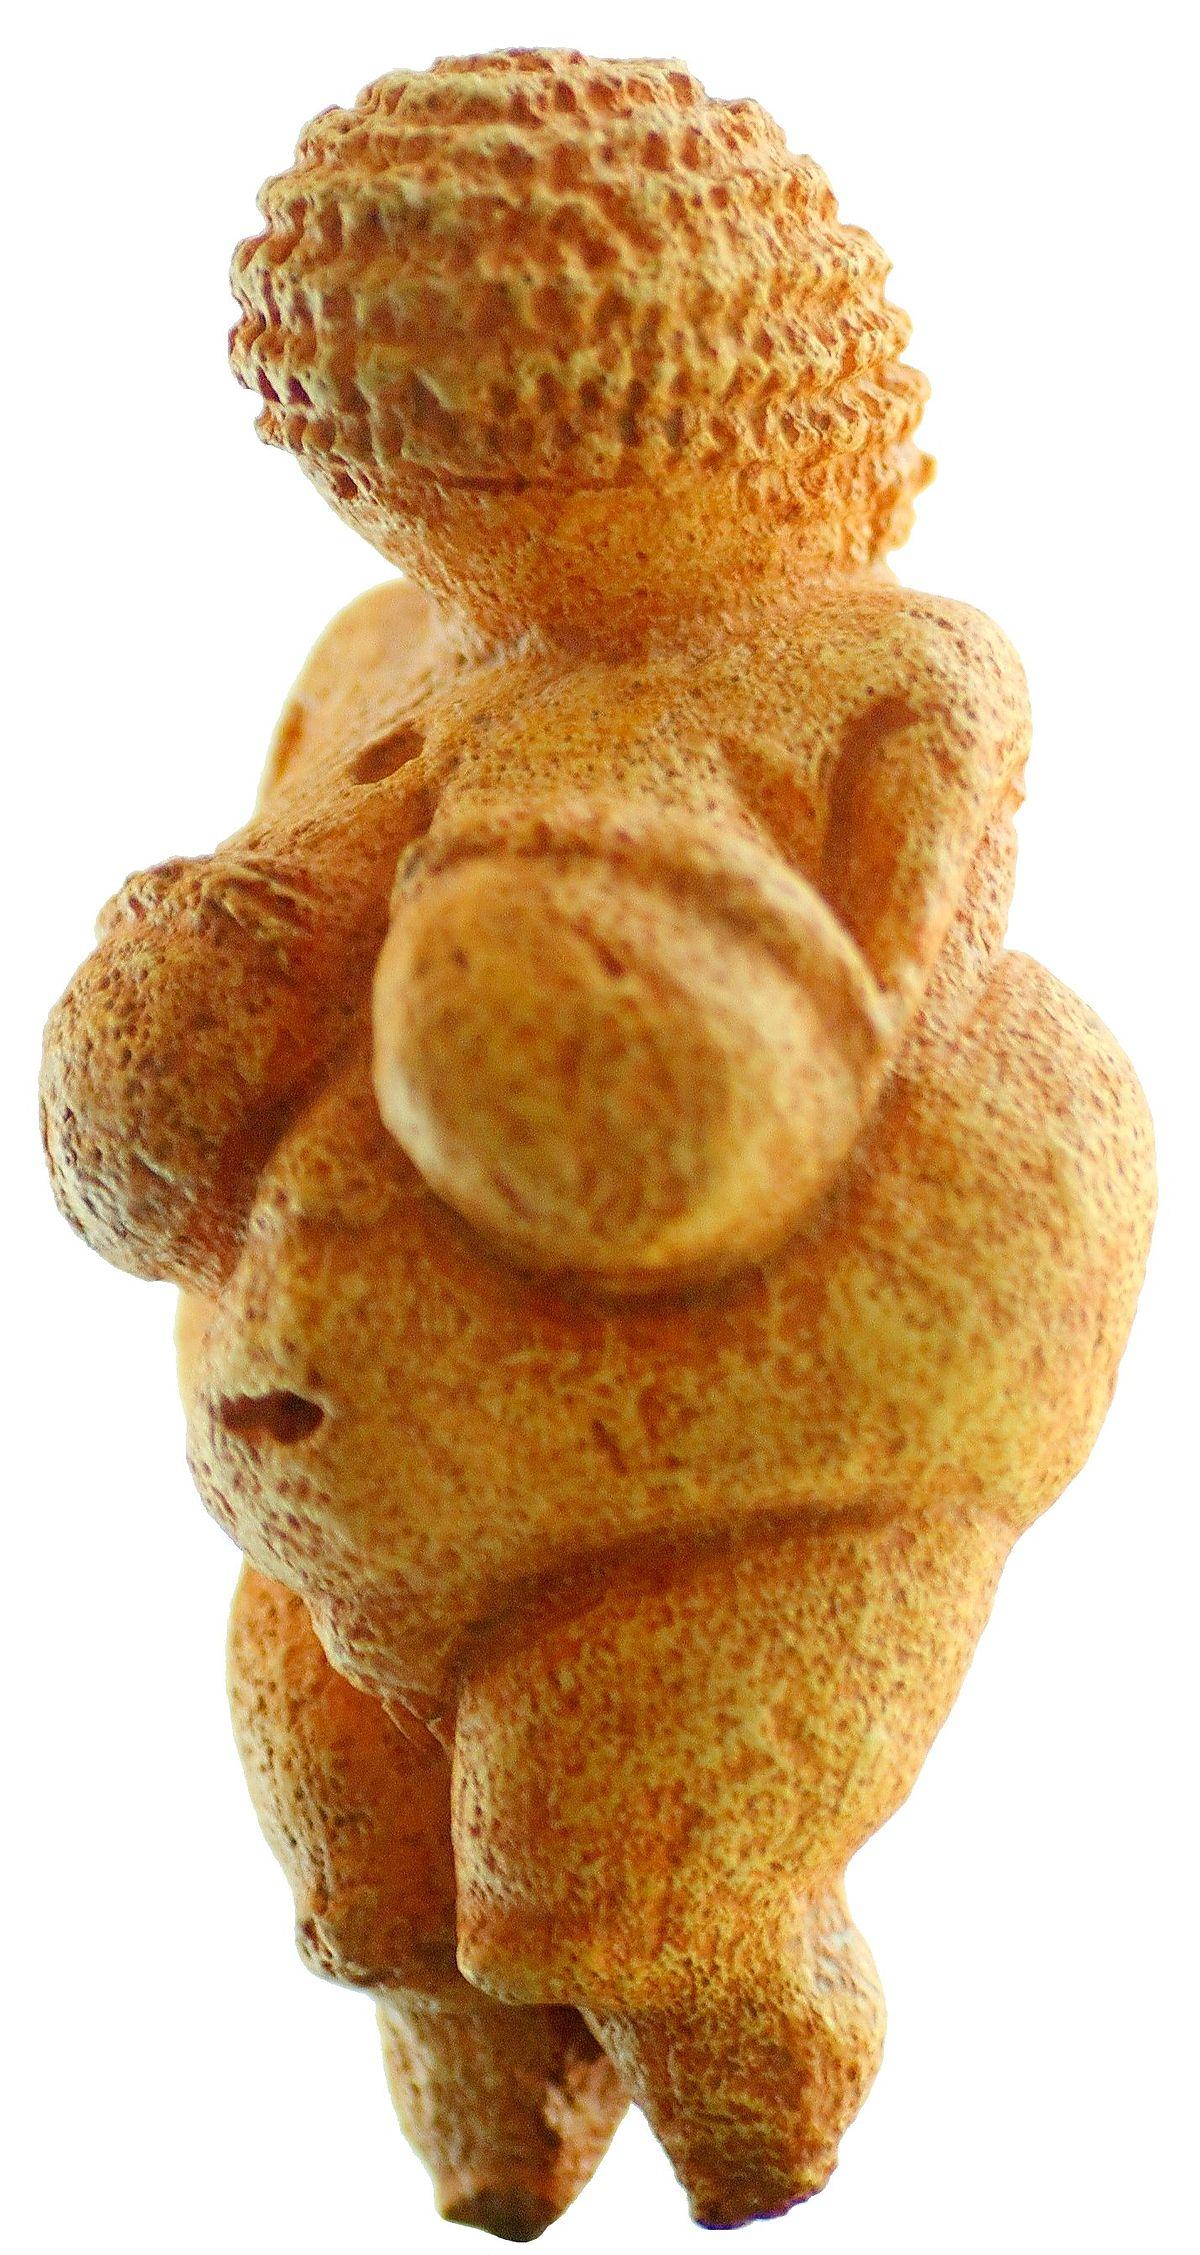 Статуэтка Венеры Виллендорфской. Источник фото: Wikipedia